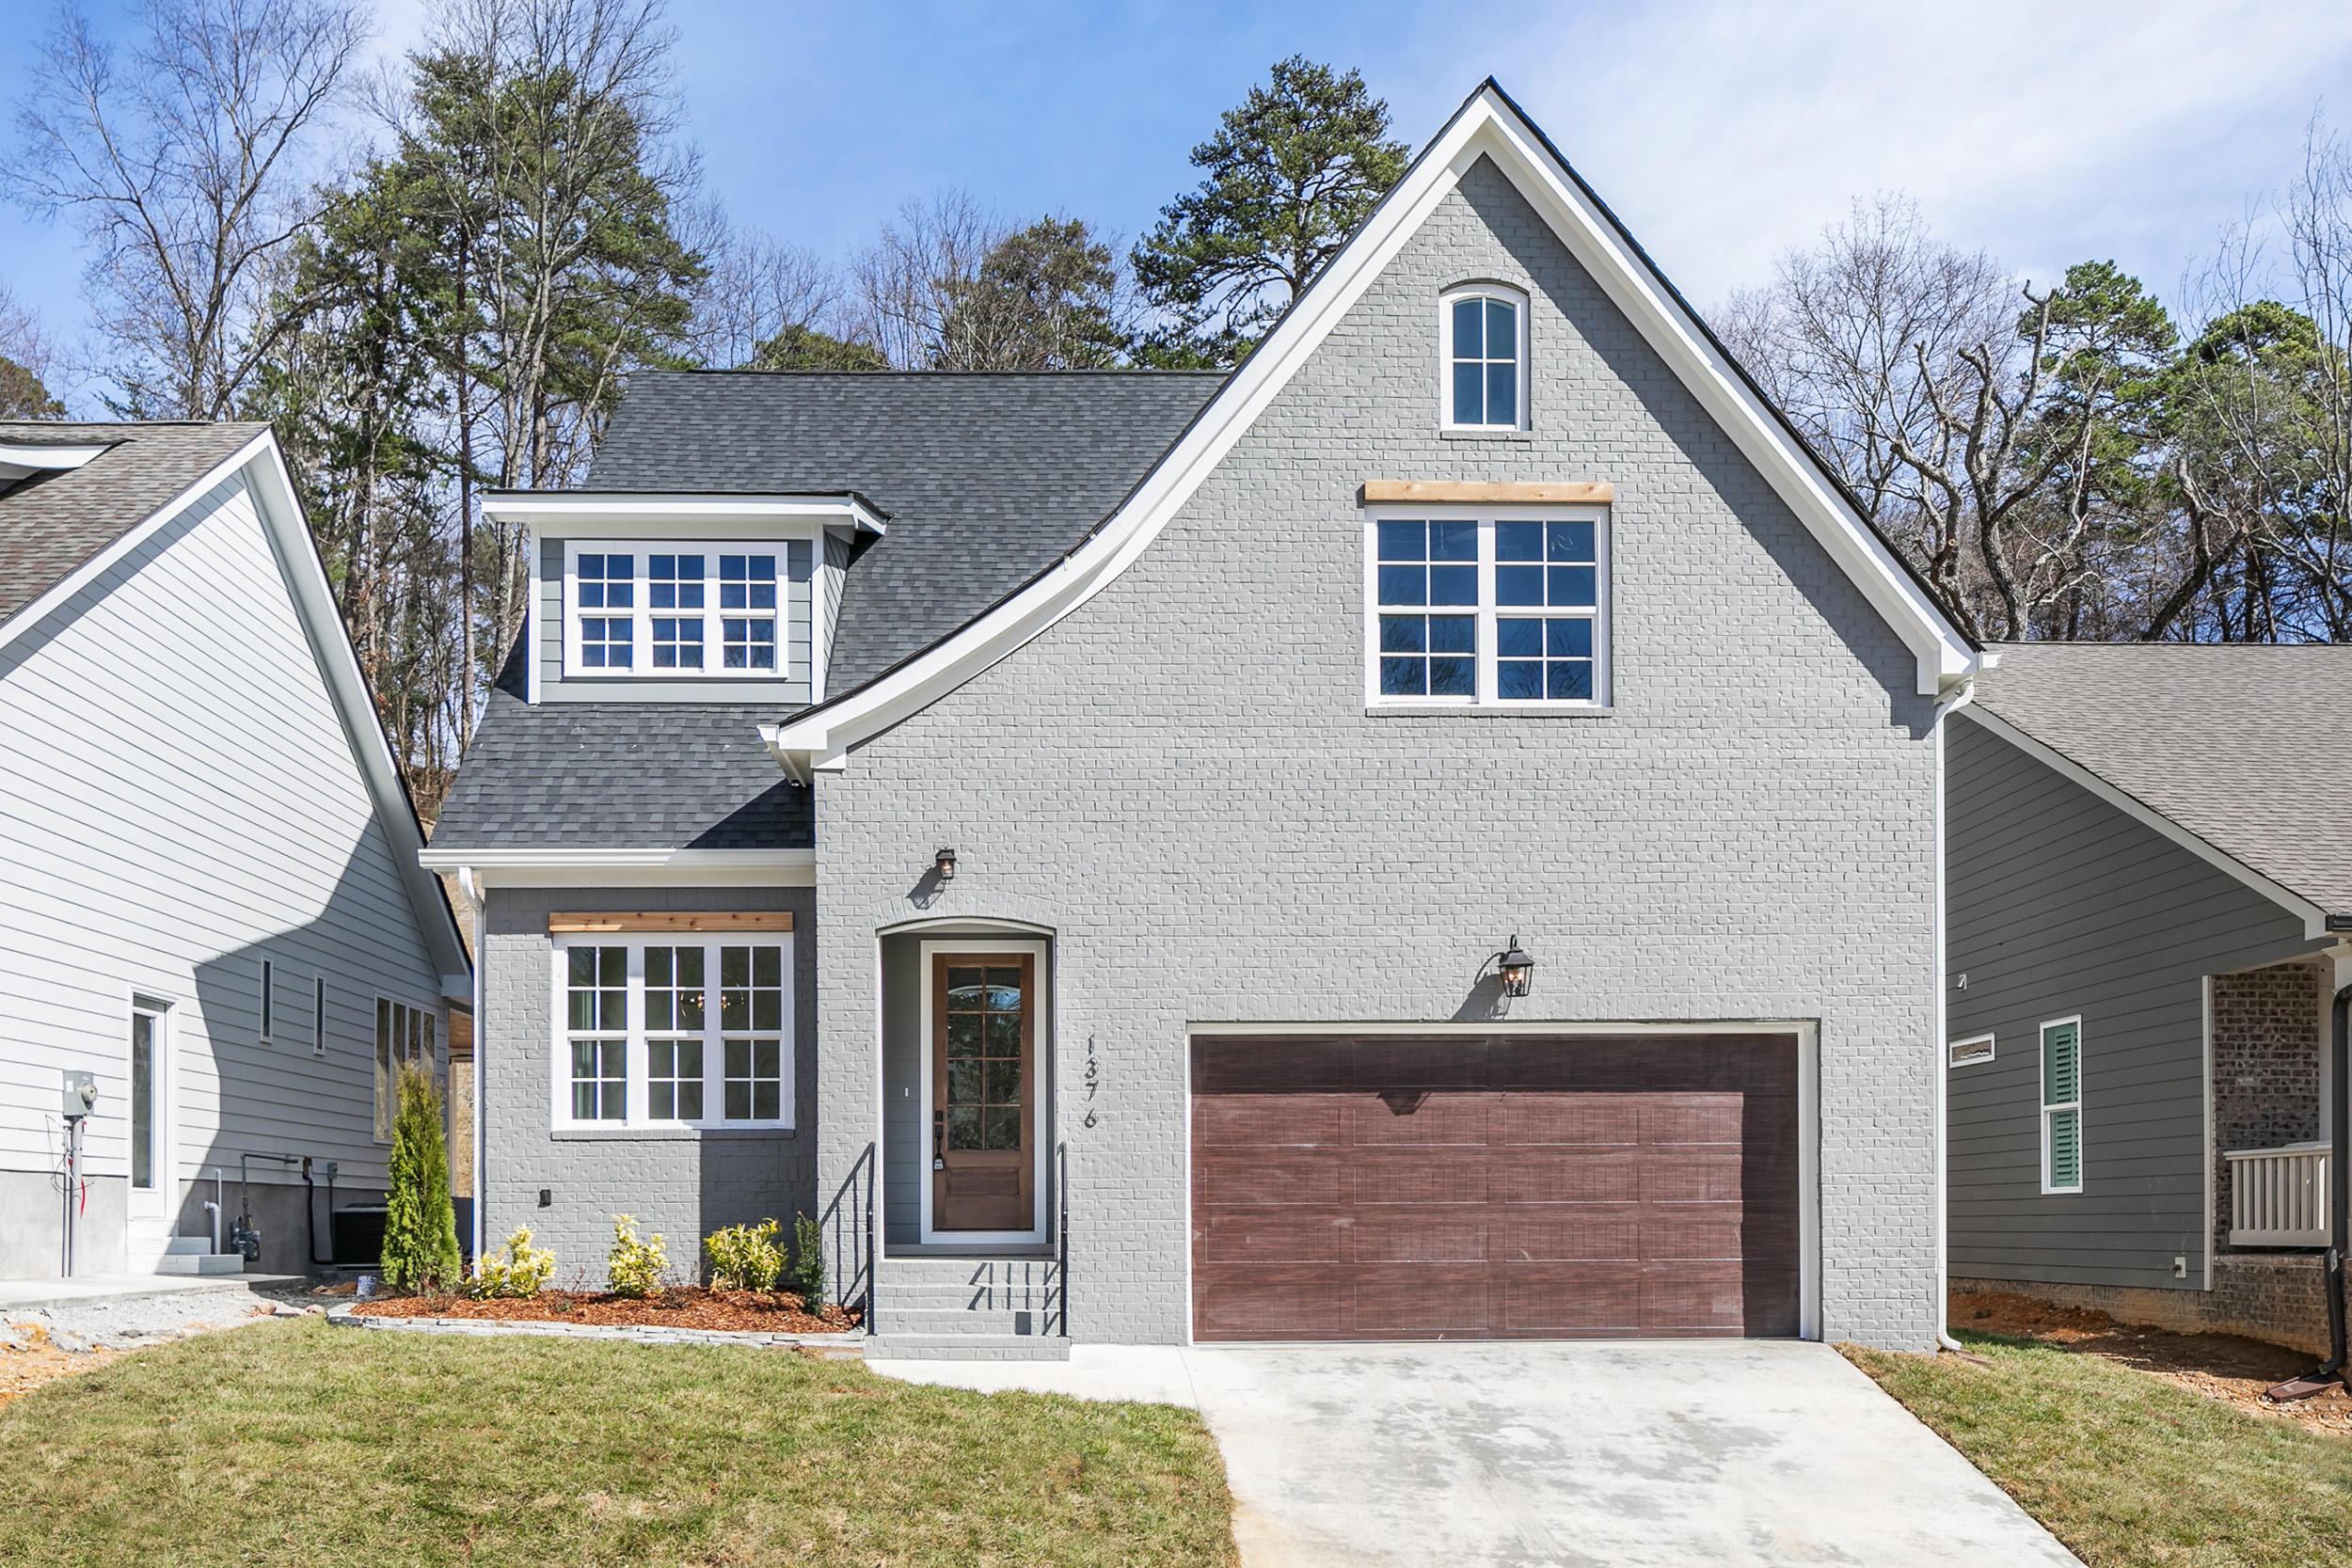 1376 Carrington Way, Chattanooga, TN 37405